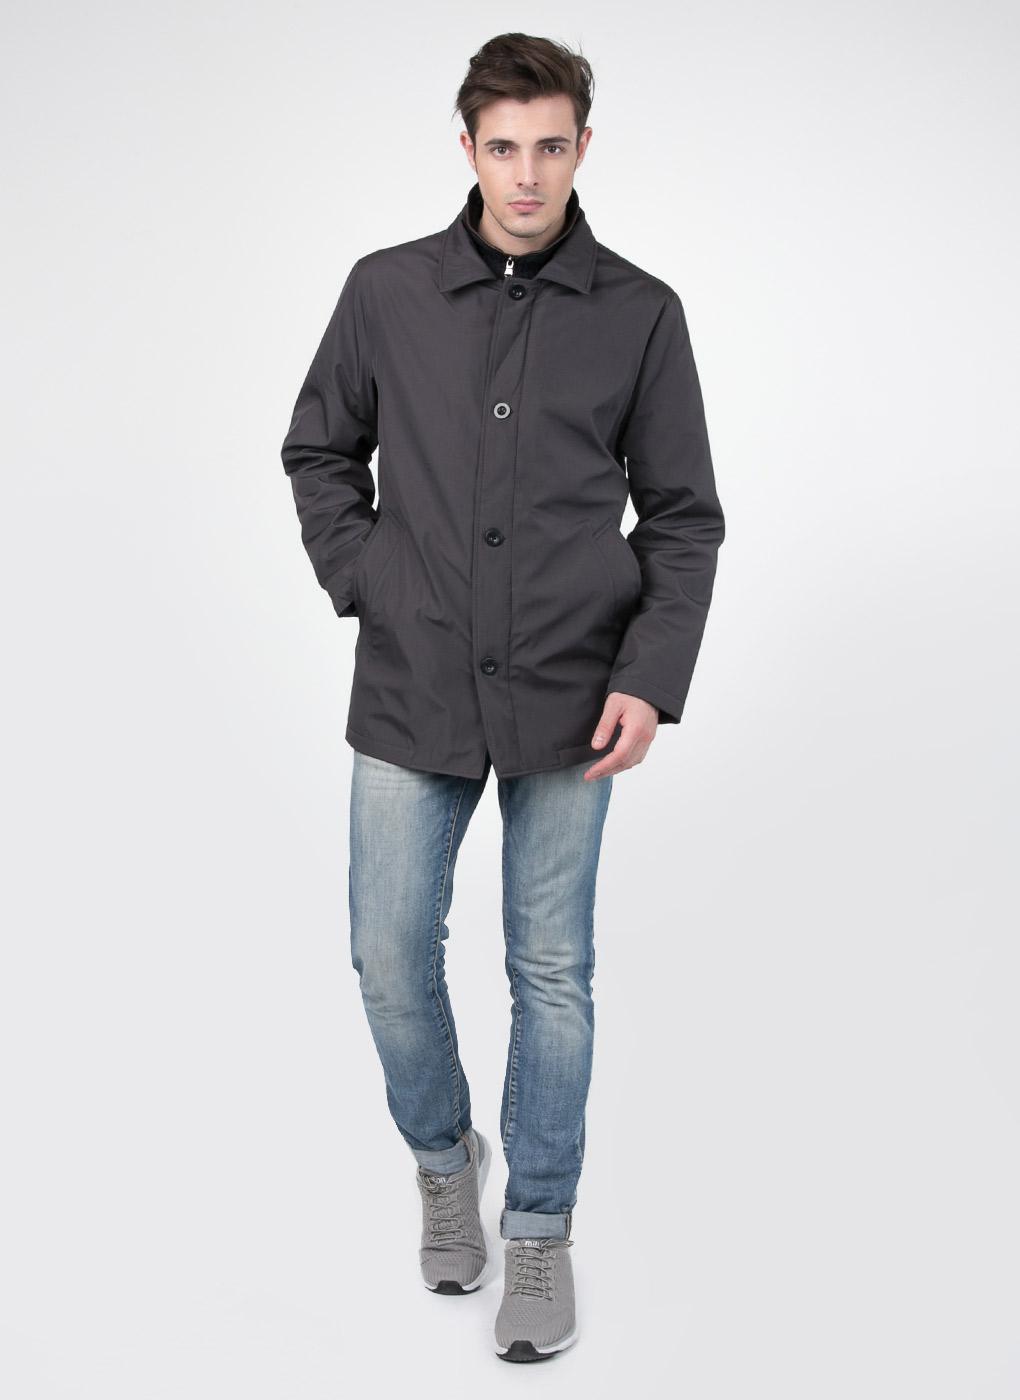 Куртка мужская утепленная 43, MILTON фото